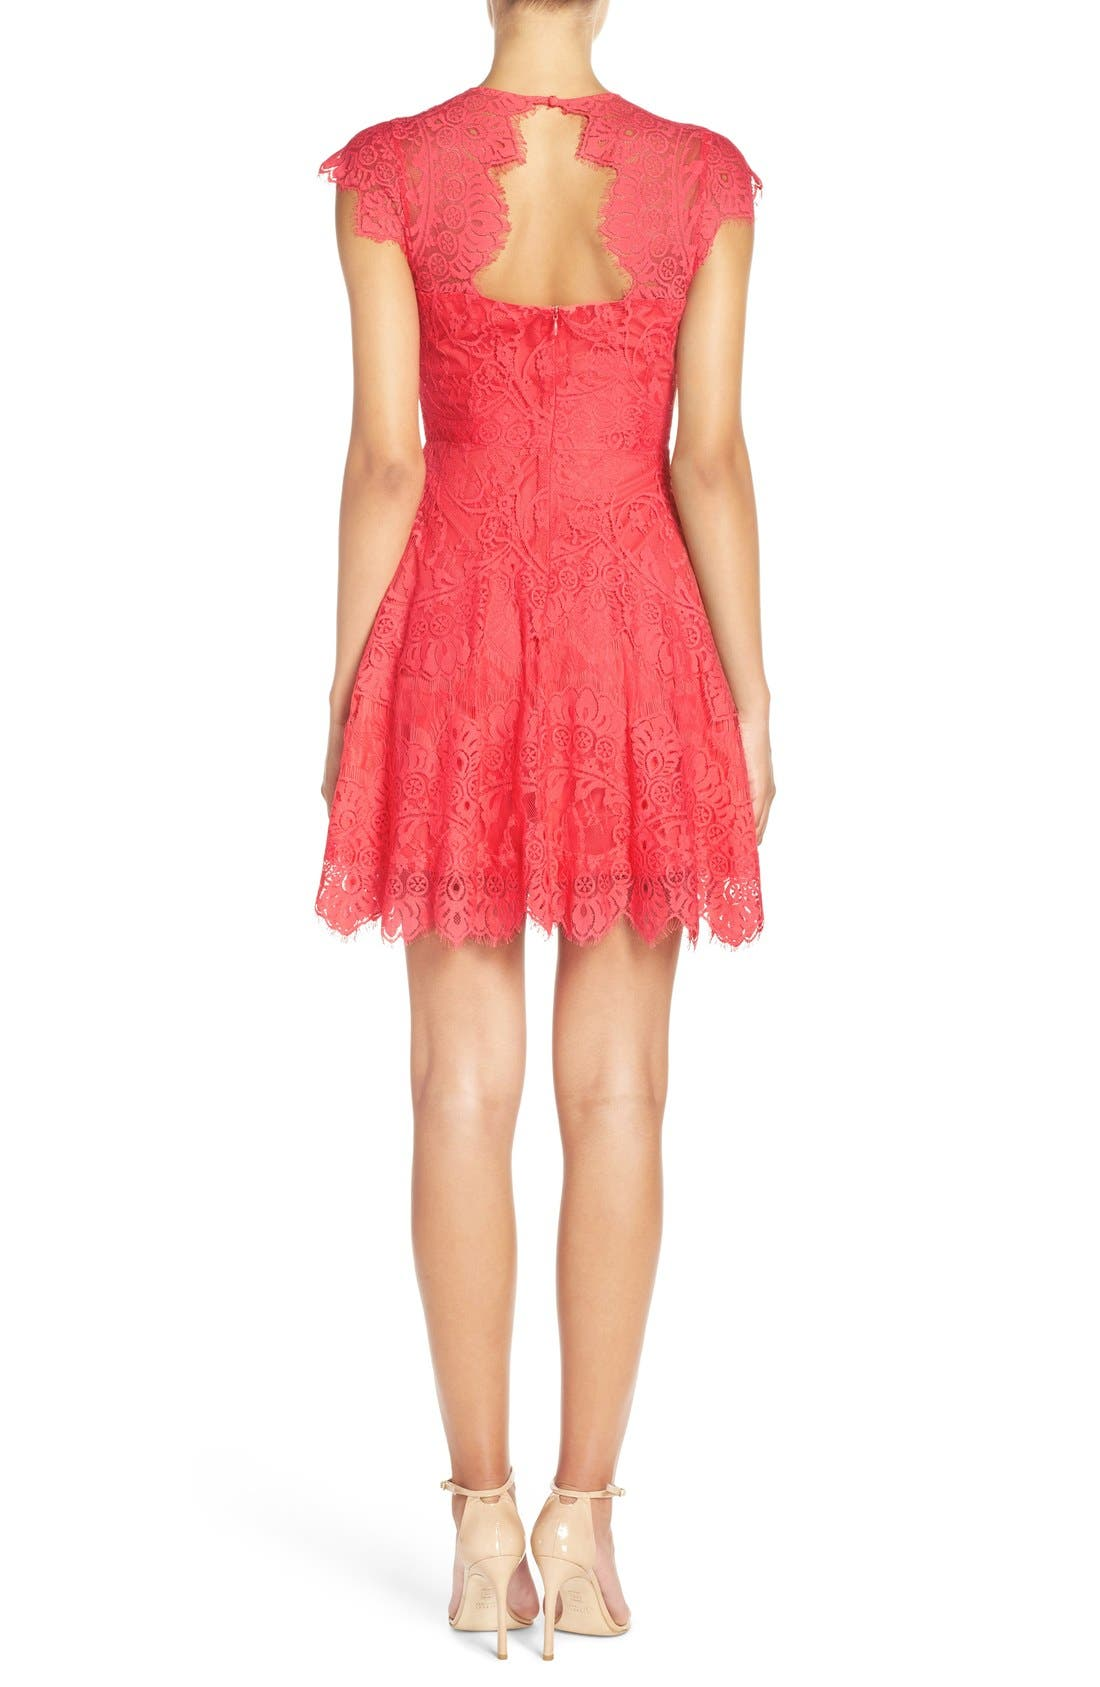 Alternate Image 2  - BB Dakota 'Rhianna' Illusion Yoke Lace Fit & Flare Dress (Nordstrom Exclusive)